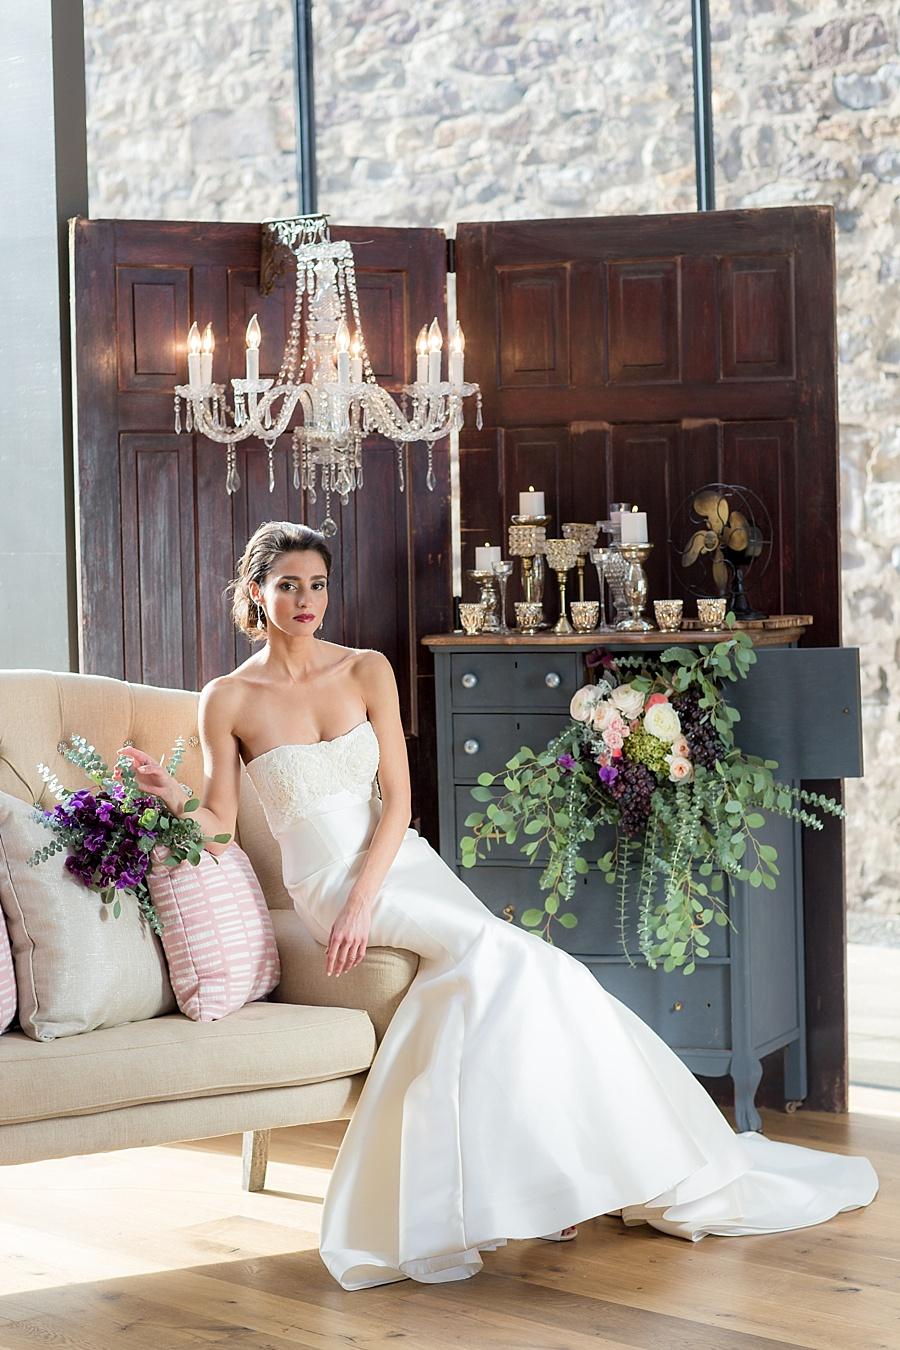 Vanessa_Joy_Photography_Details_of_I_do_Jean_Ralph_Thurin_Wedding_Gowns_April_Lynn_Designs_Wedding_Stationery21